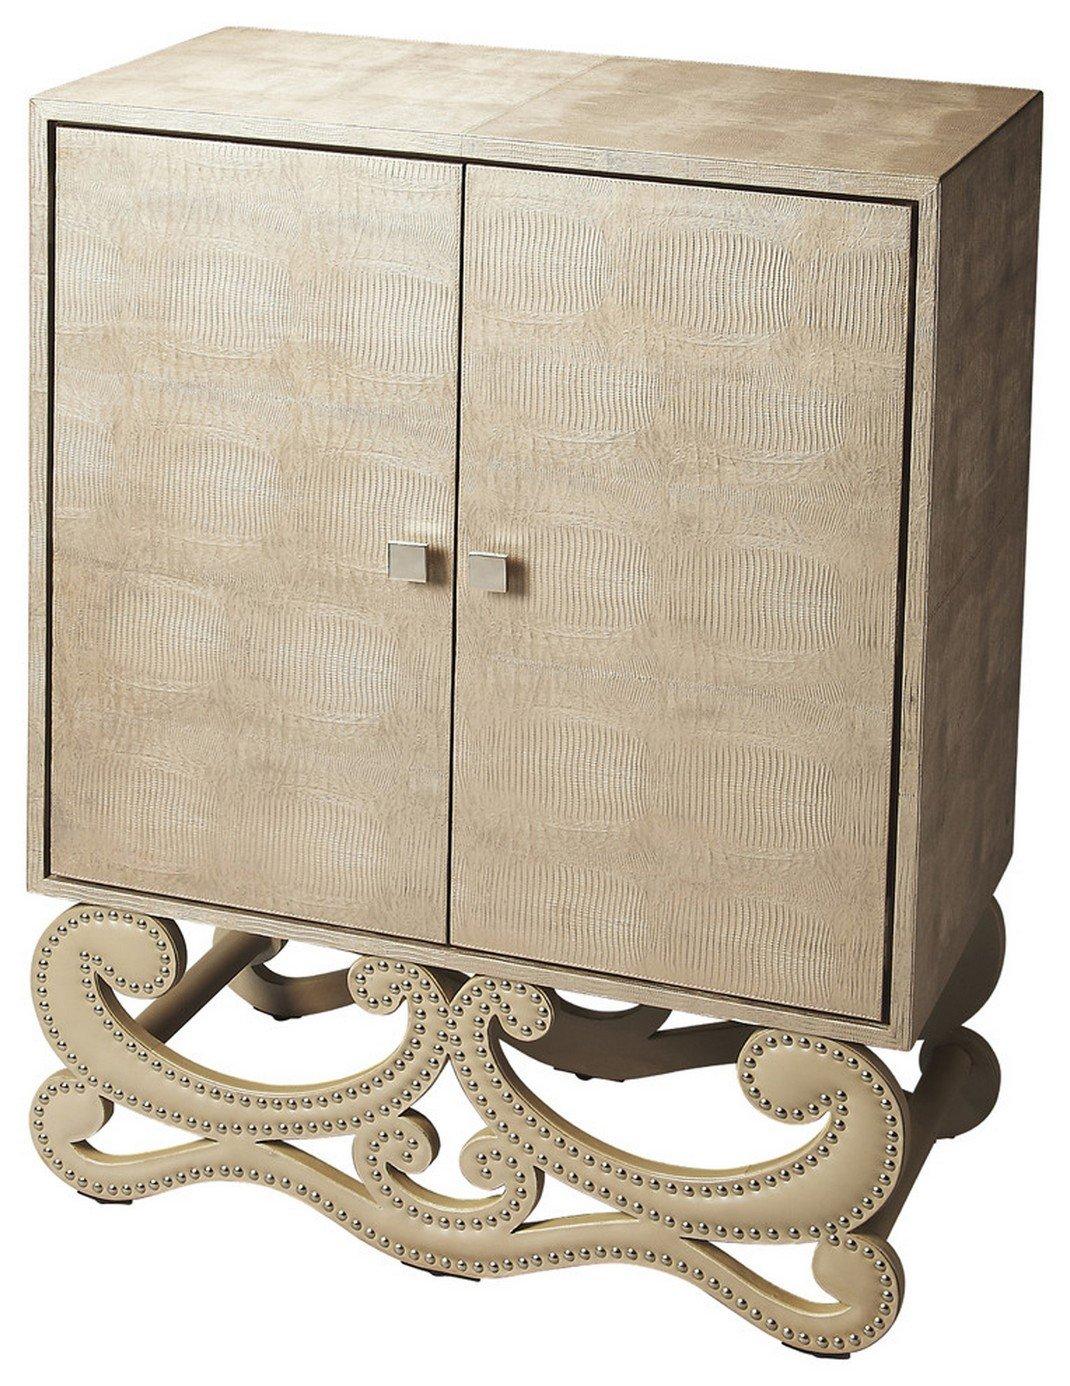 Butler Garfield Leather Accent Cabinet, 34-1/4'' x 17-1/2'' x 47-1/2'', Butler Loft Finish